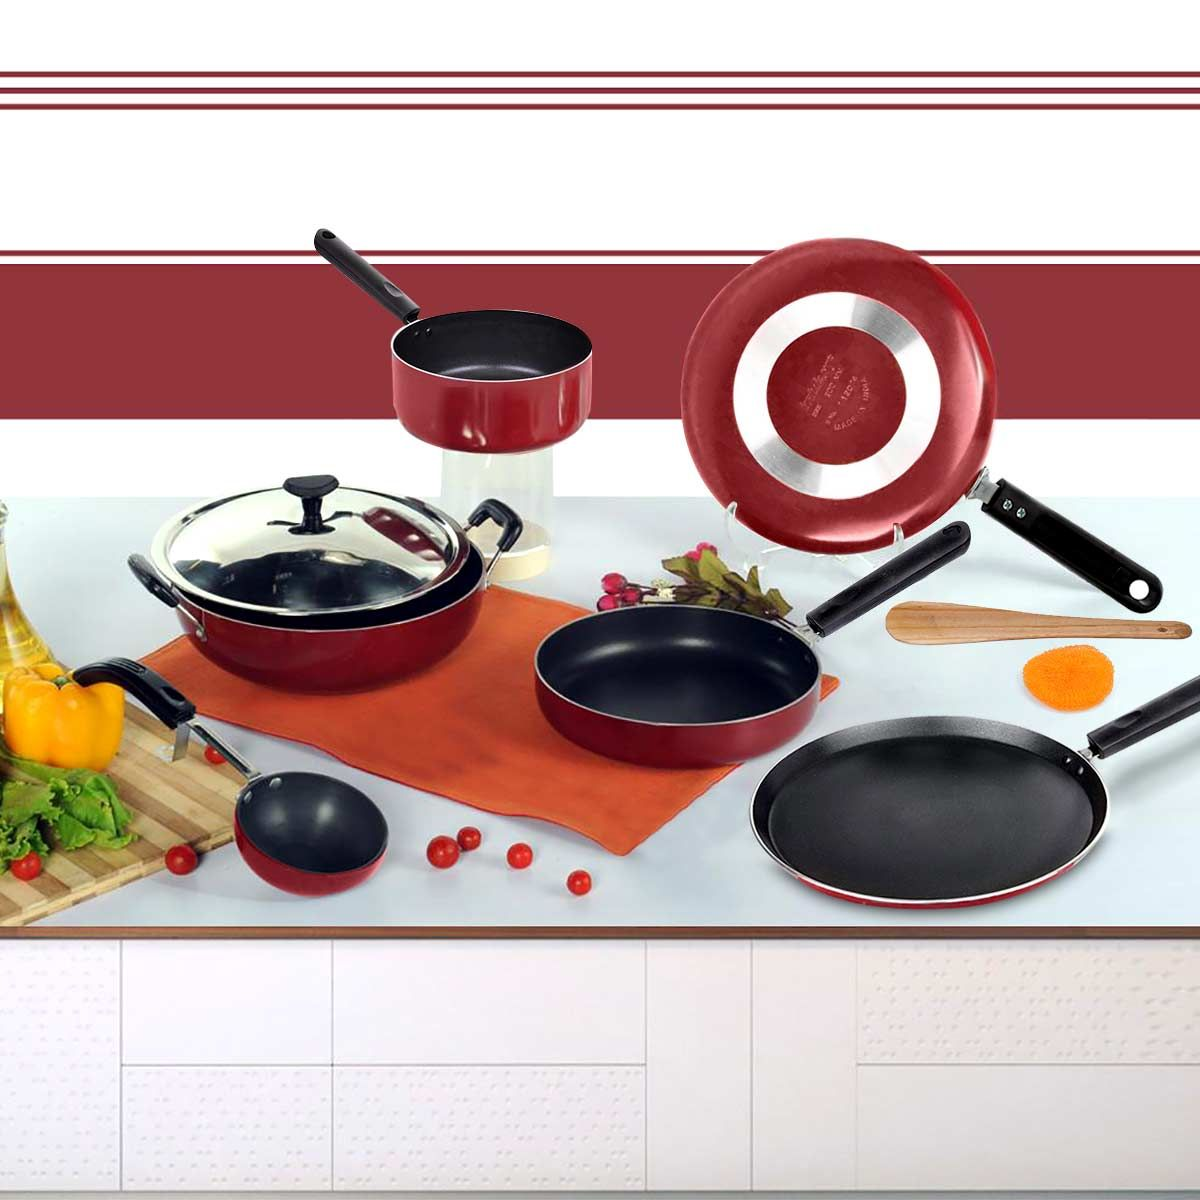 Non Stick Kitchen Set With Price: Buy Brilliant 7pcs Nonstick Cookware Set Online At Best